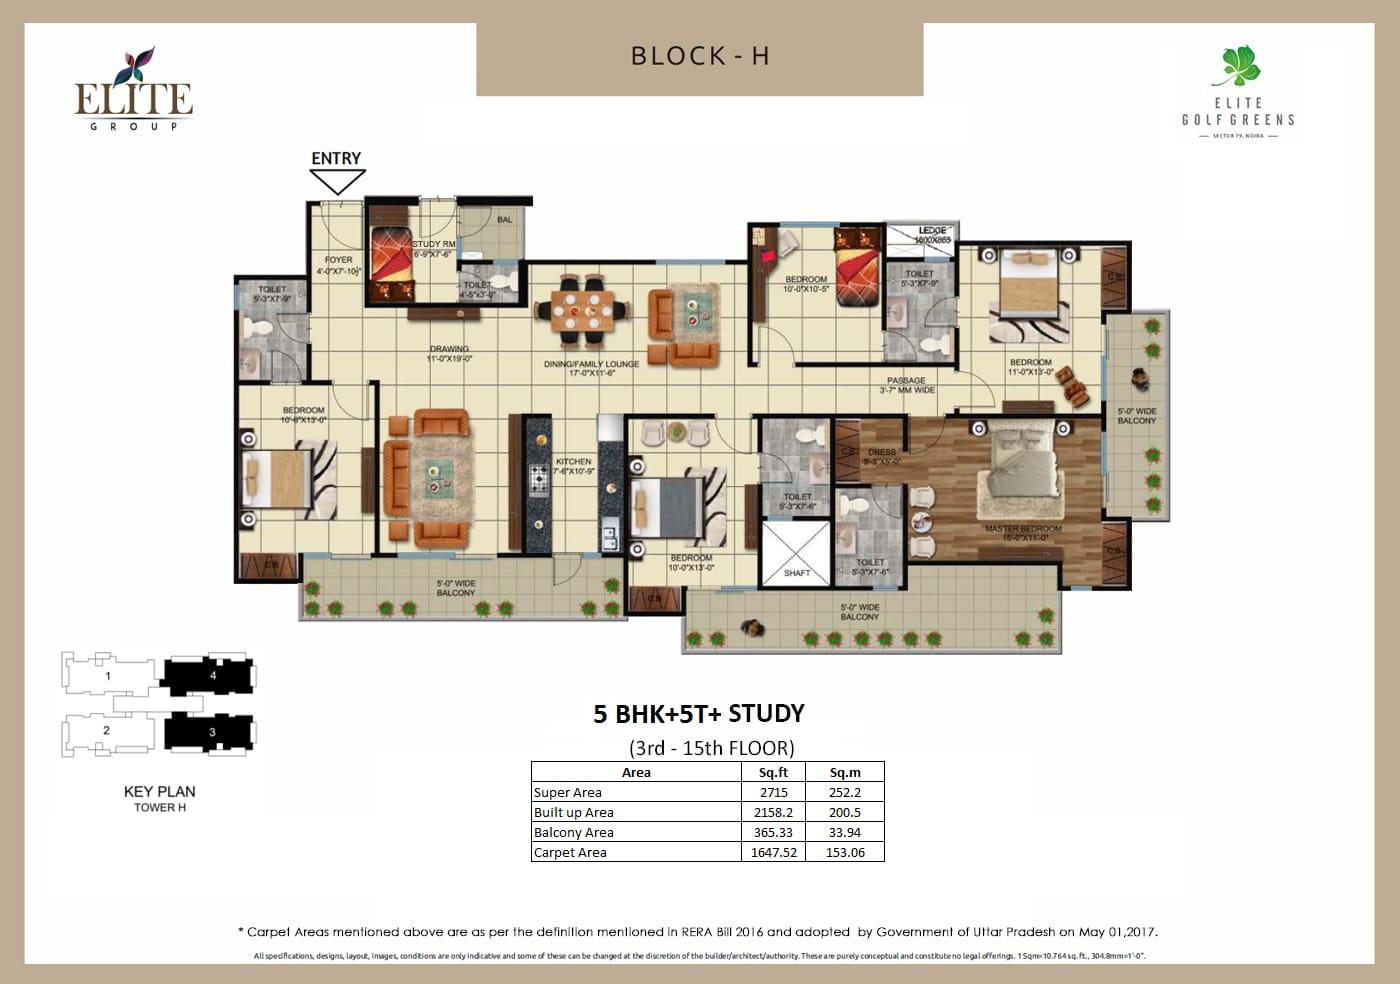 EliteGolfGreens Floor Plans 10